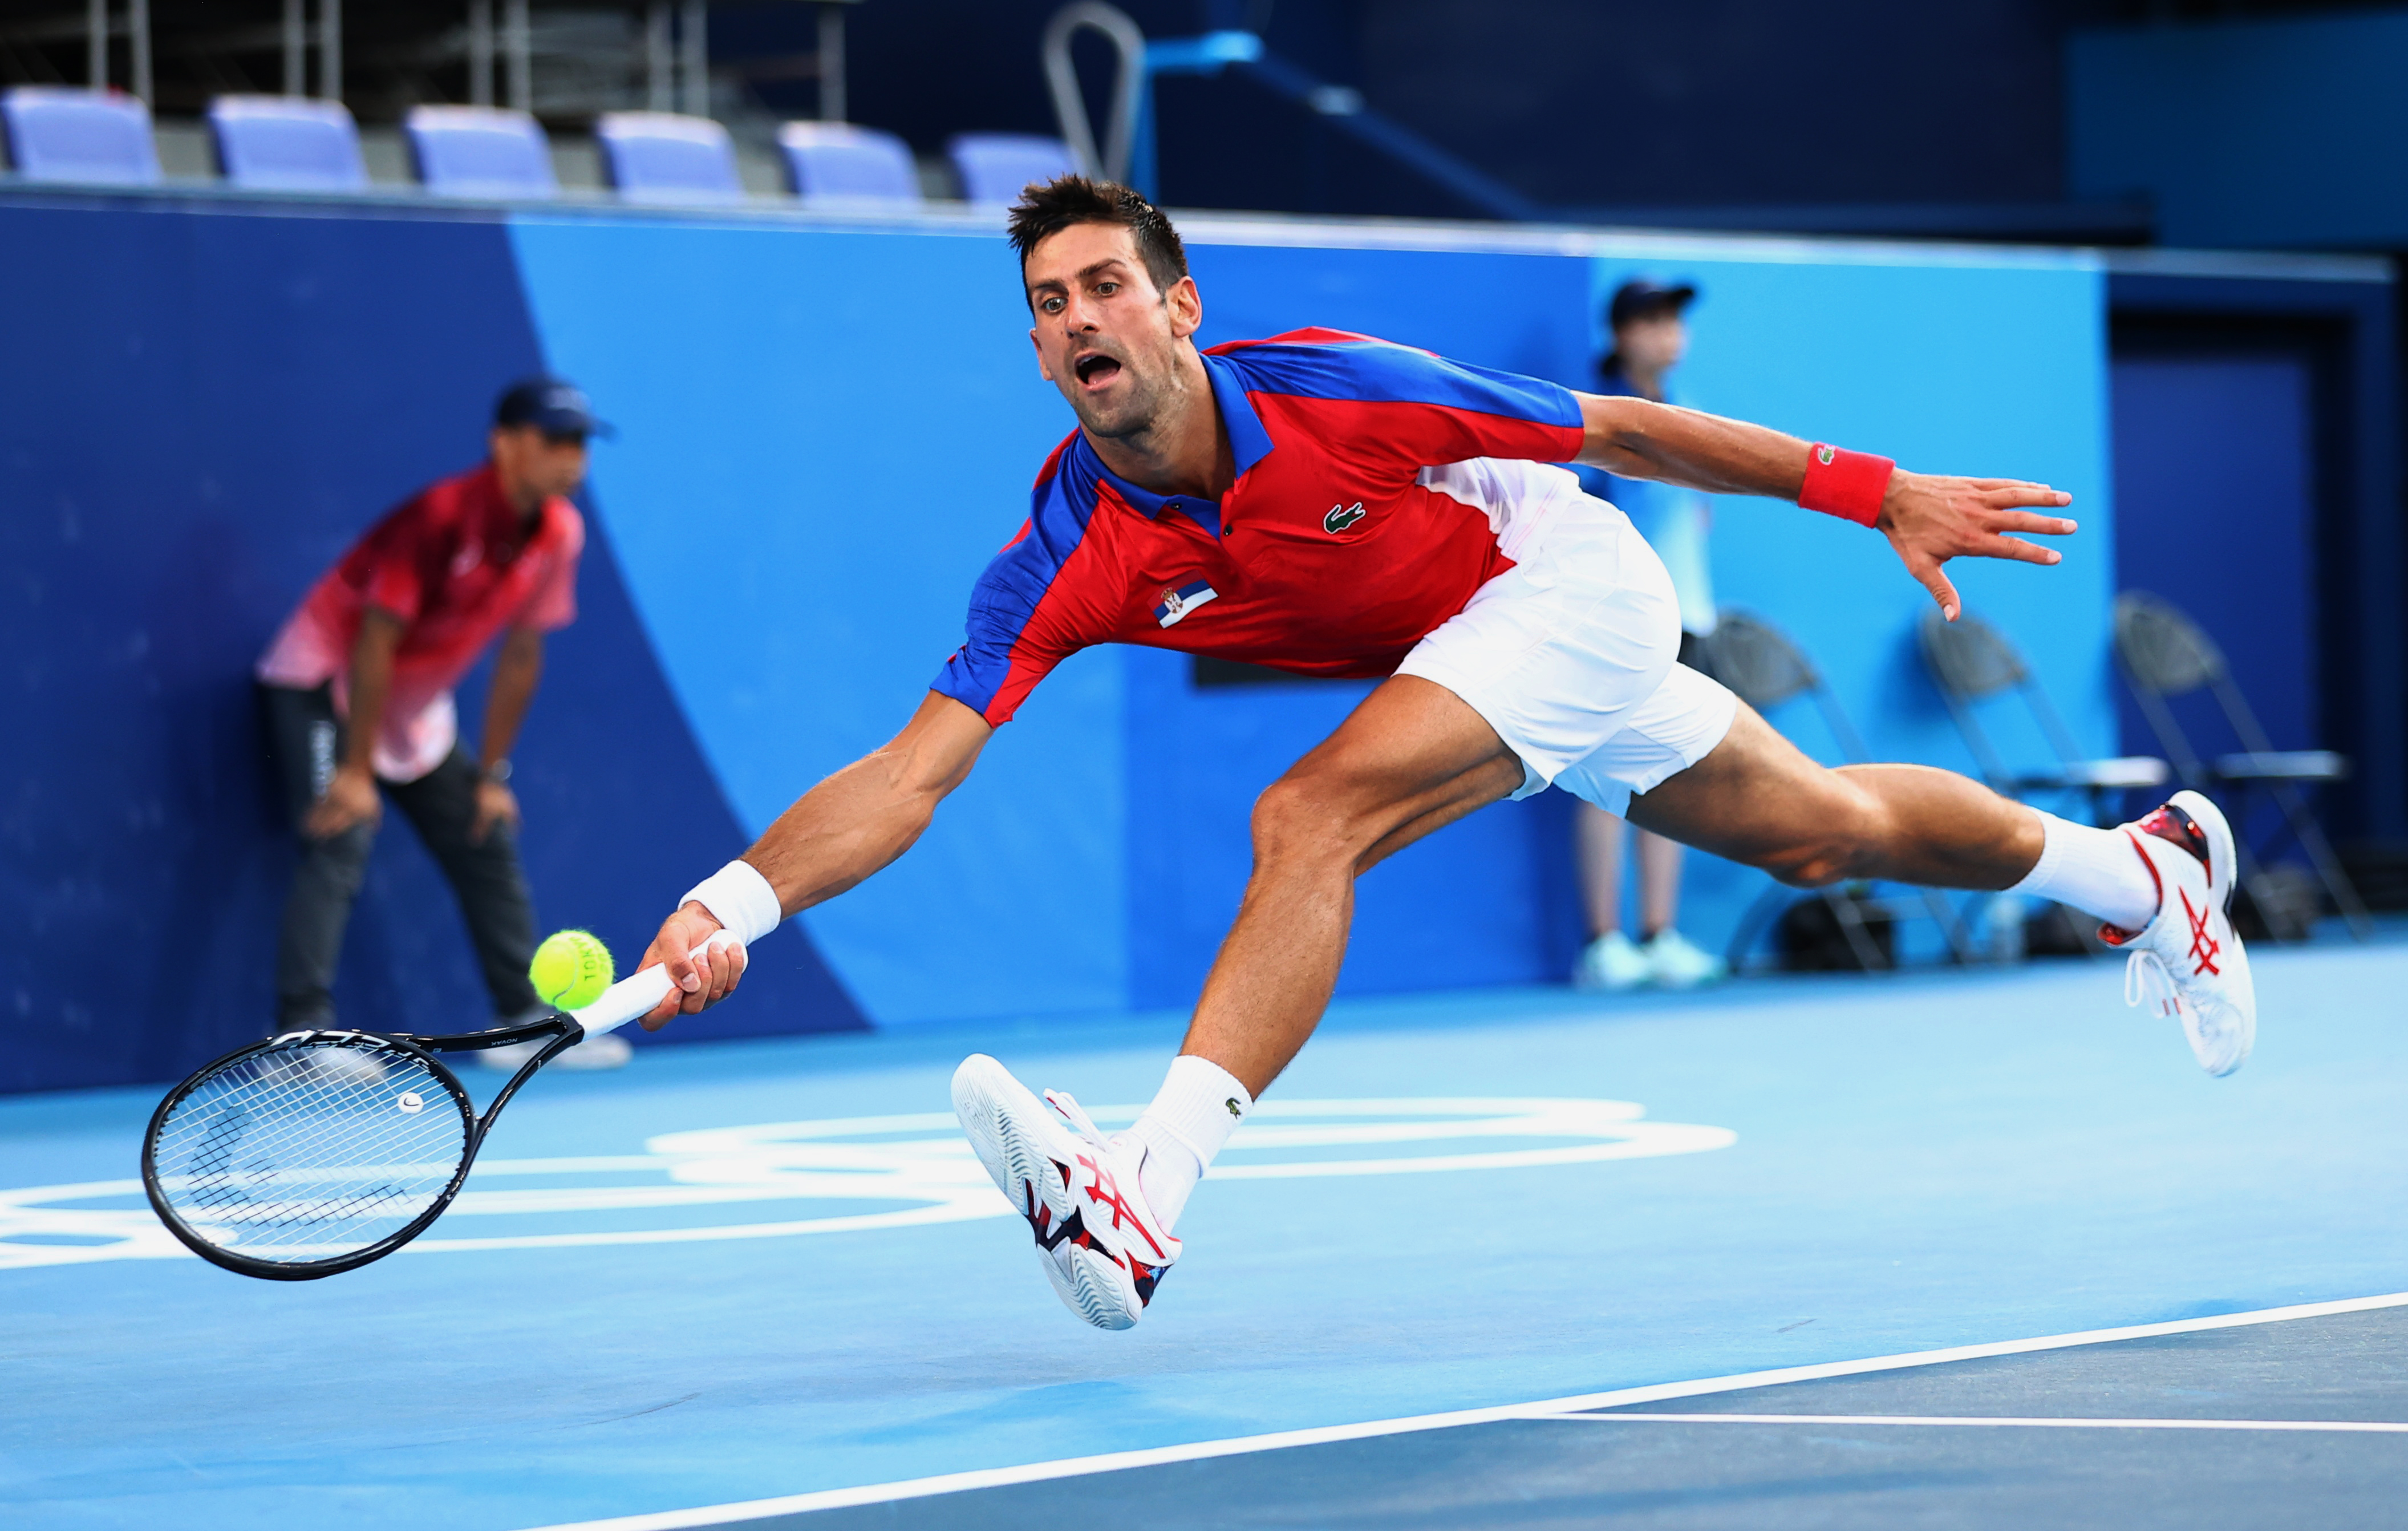 Tokyo 2020 Olympics - Tennis - Men's Singles - Bronze medal match - Ariake Tennis Park - Tokyo, Japan - July 31, 2021. Novak Djokovic of Serbia in action during his bronze medal match against Pablo Carreno of Spain